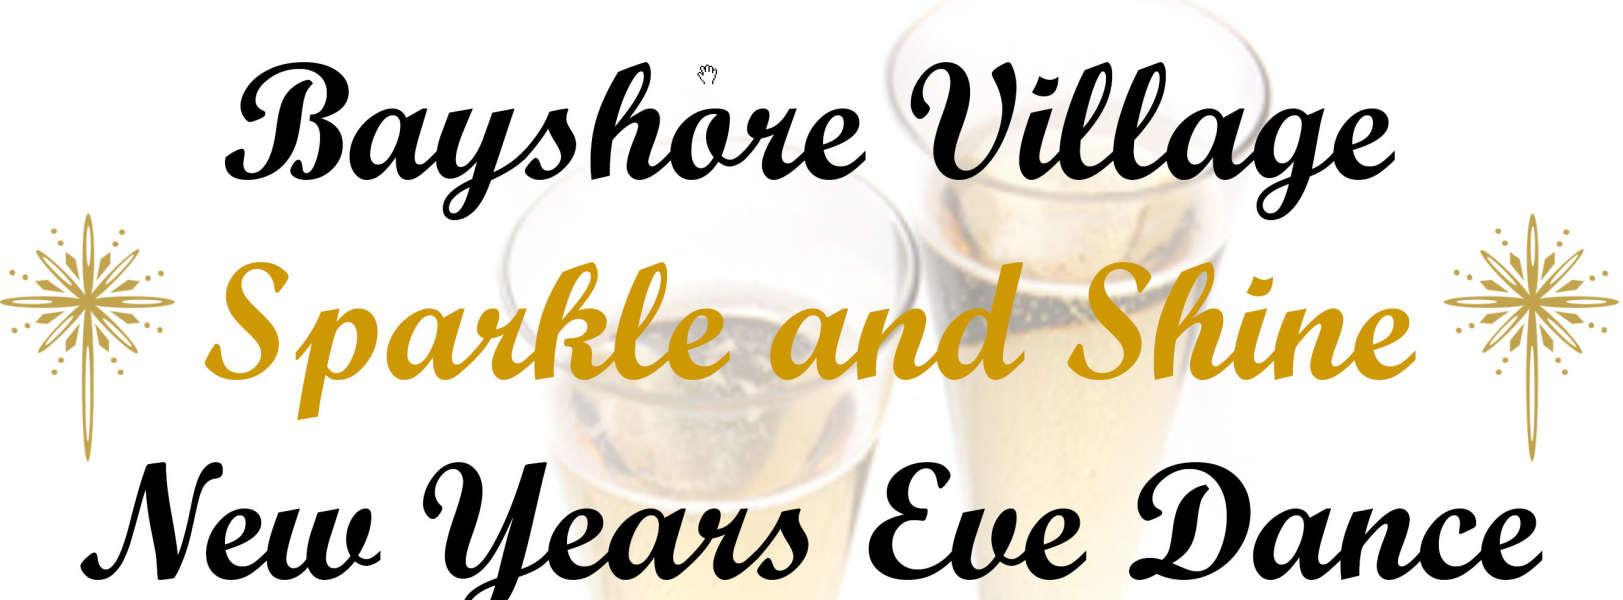 Bayshore Village News